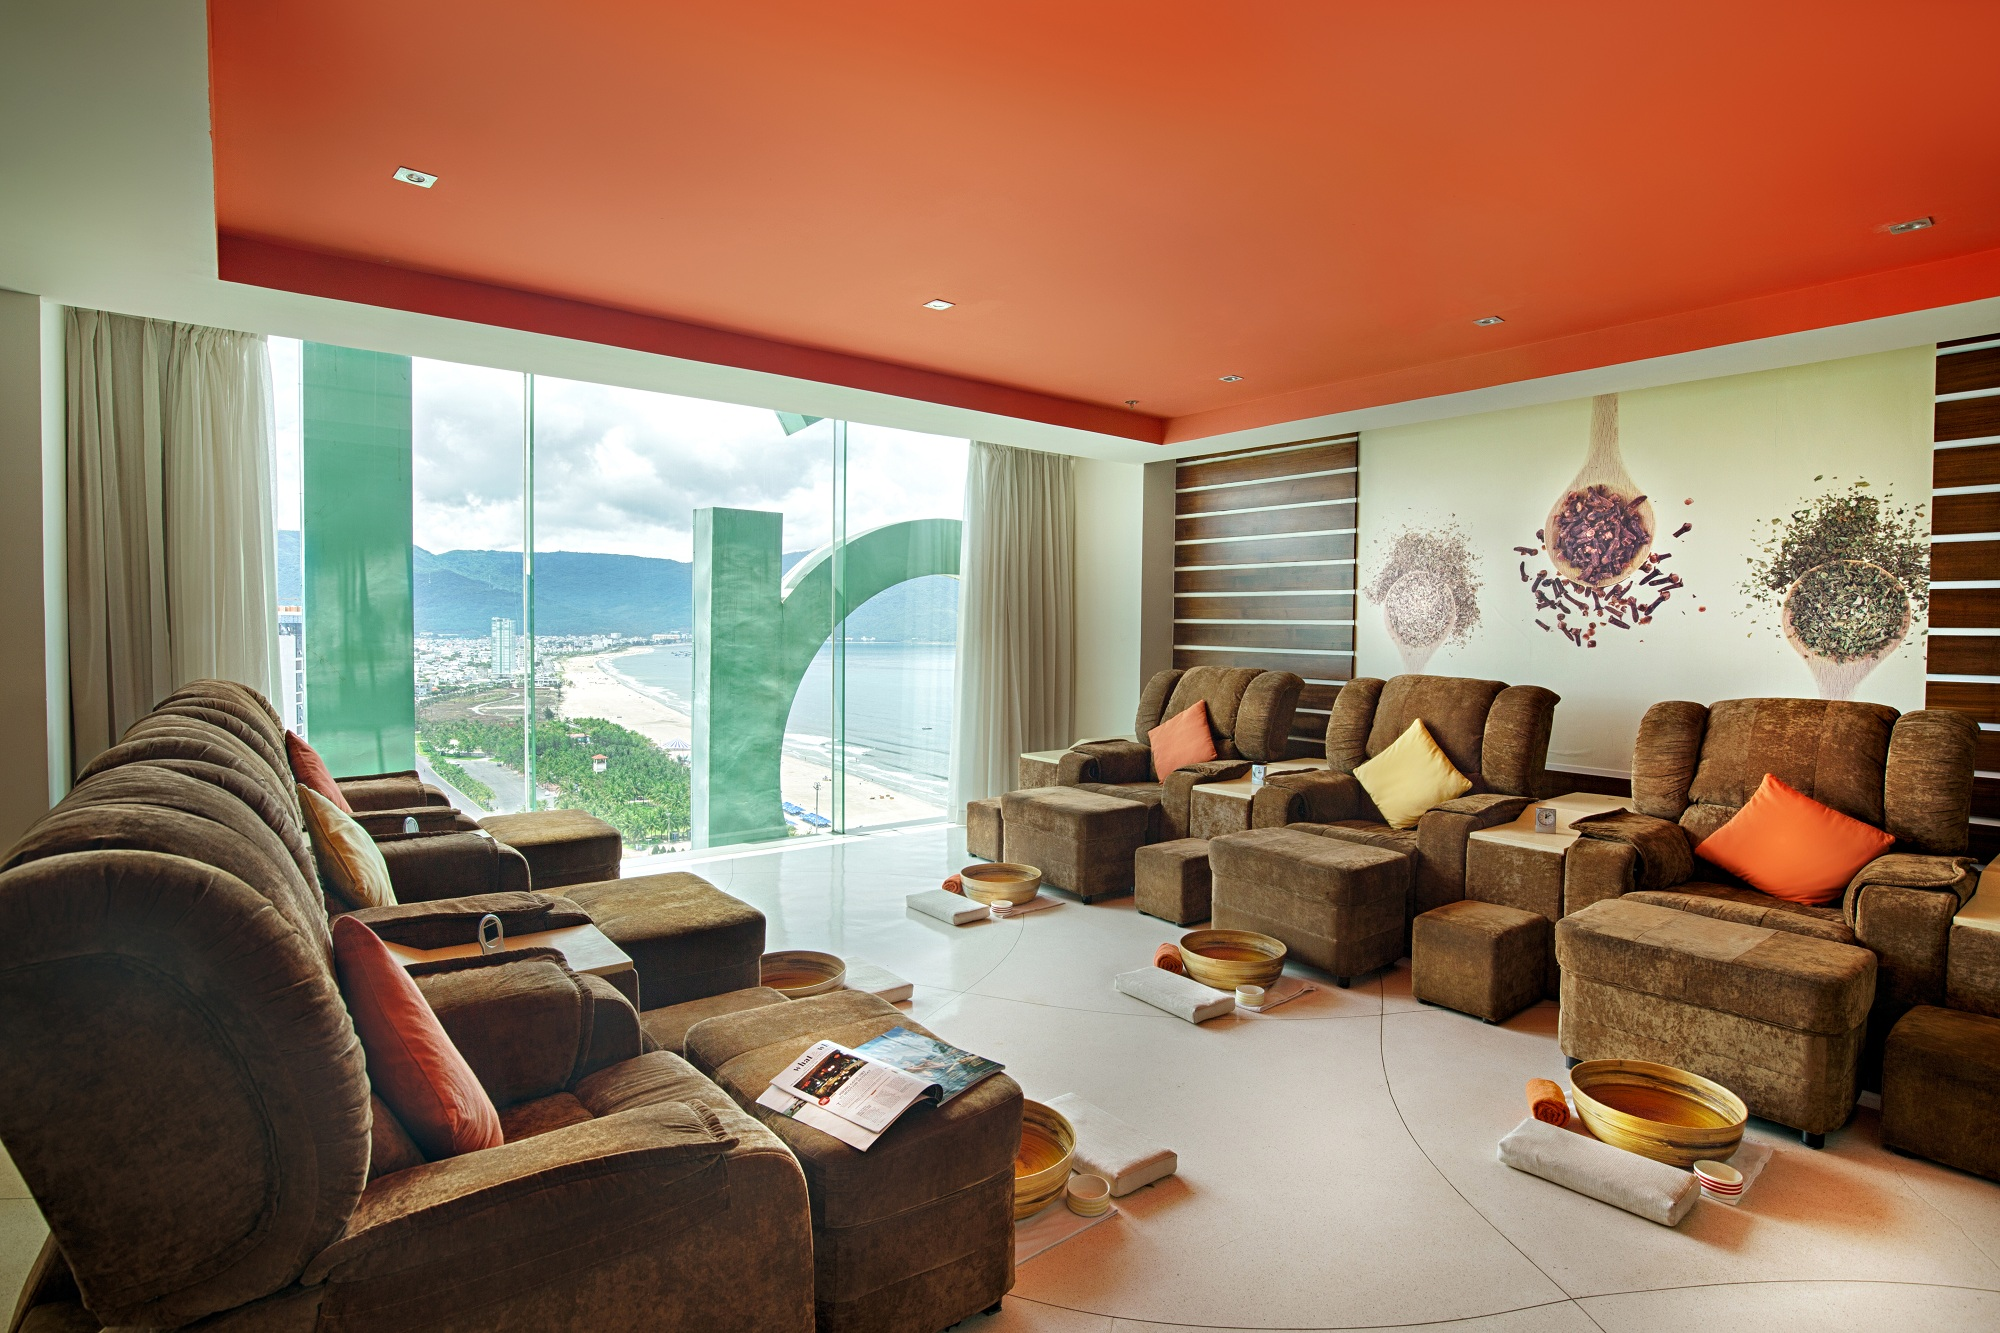 Spice Spa A La Carte Danang Beach Hotel 200 Vo Nguyen Giap Danang Fantasticity Com 05